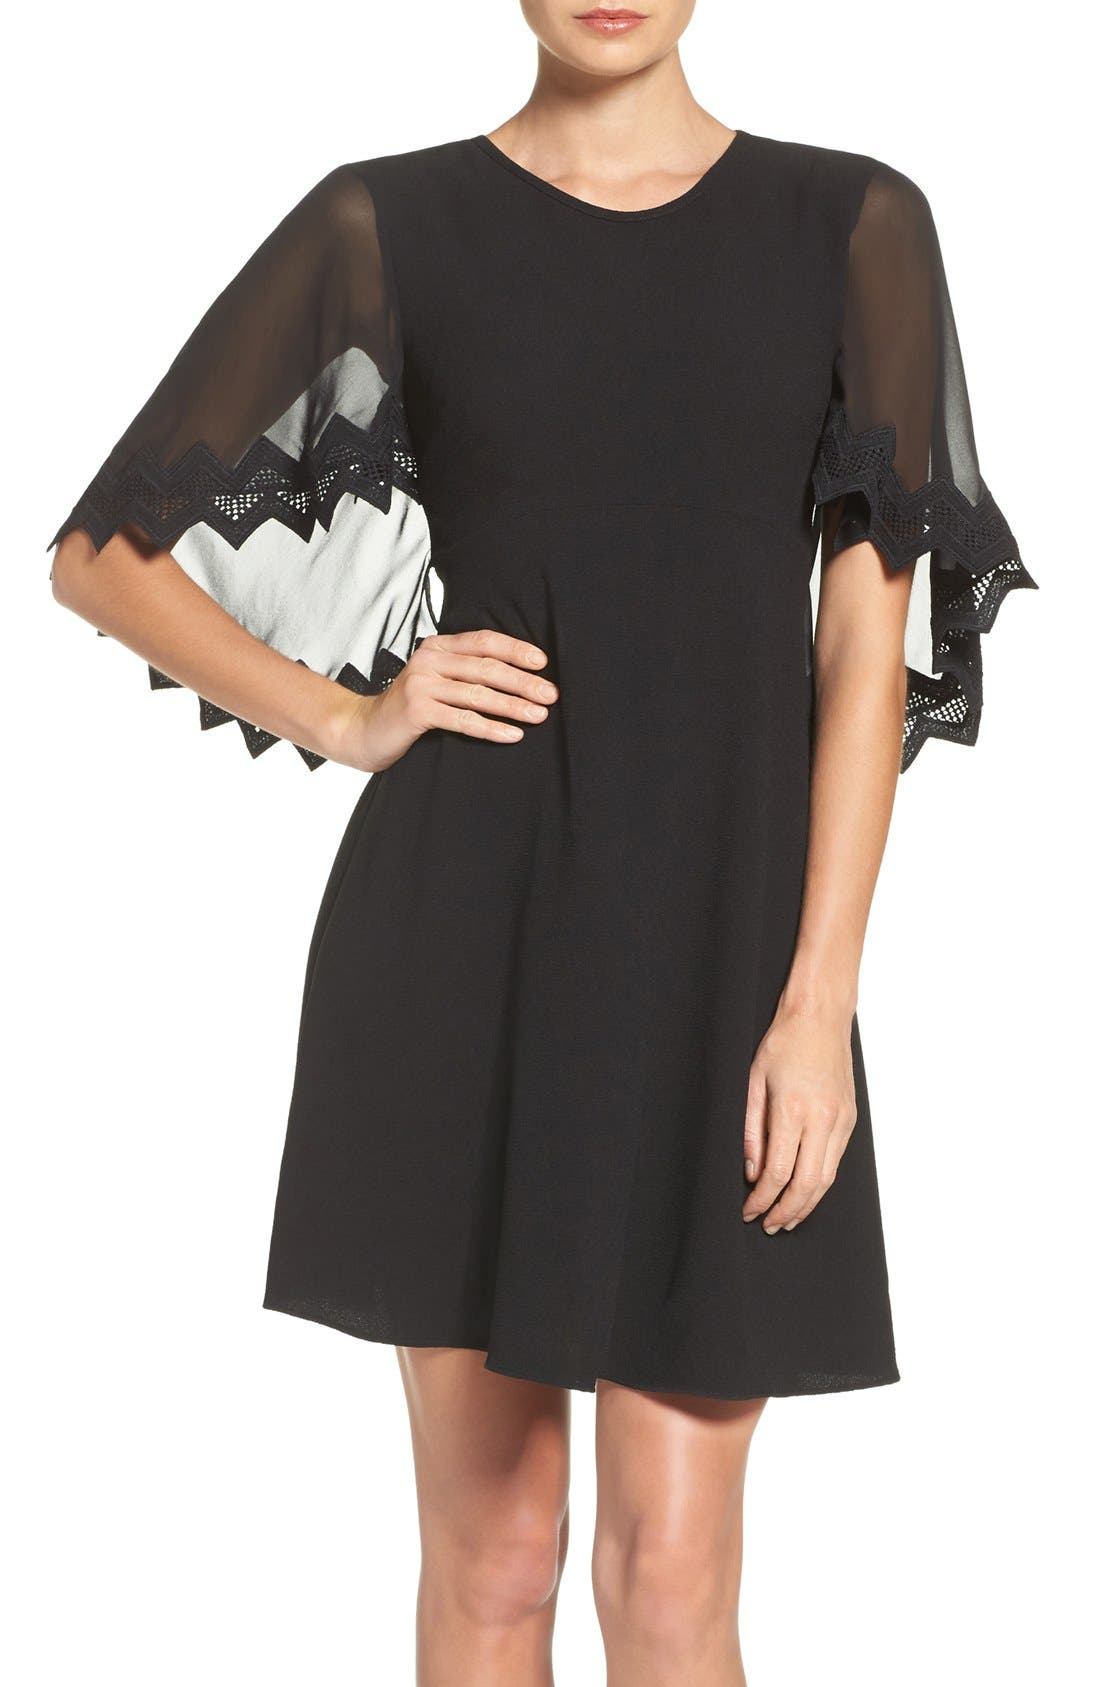 Alternate Image 1 Selected - Taylor Dresses Chiffon Caplet Dress